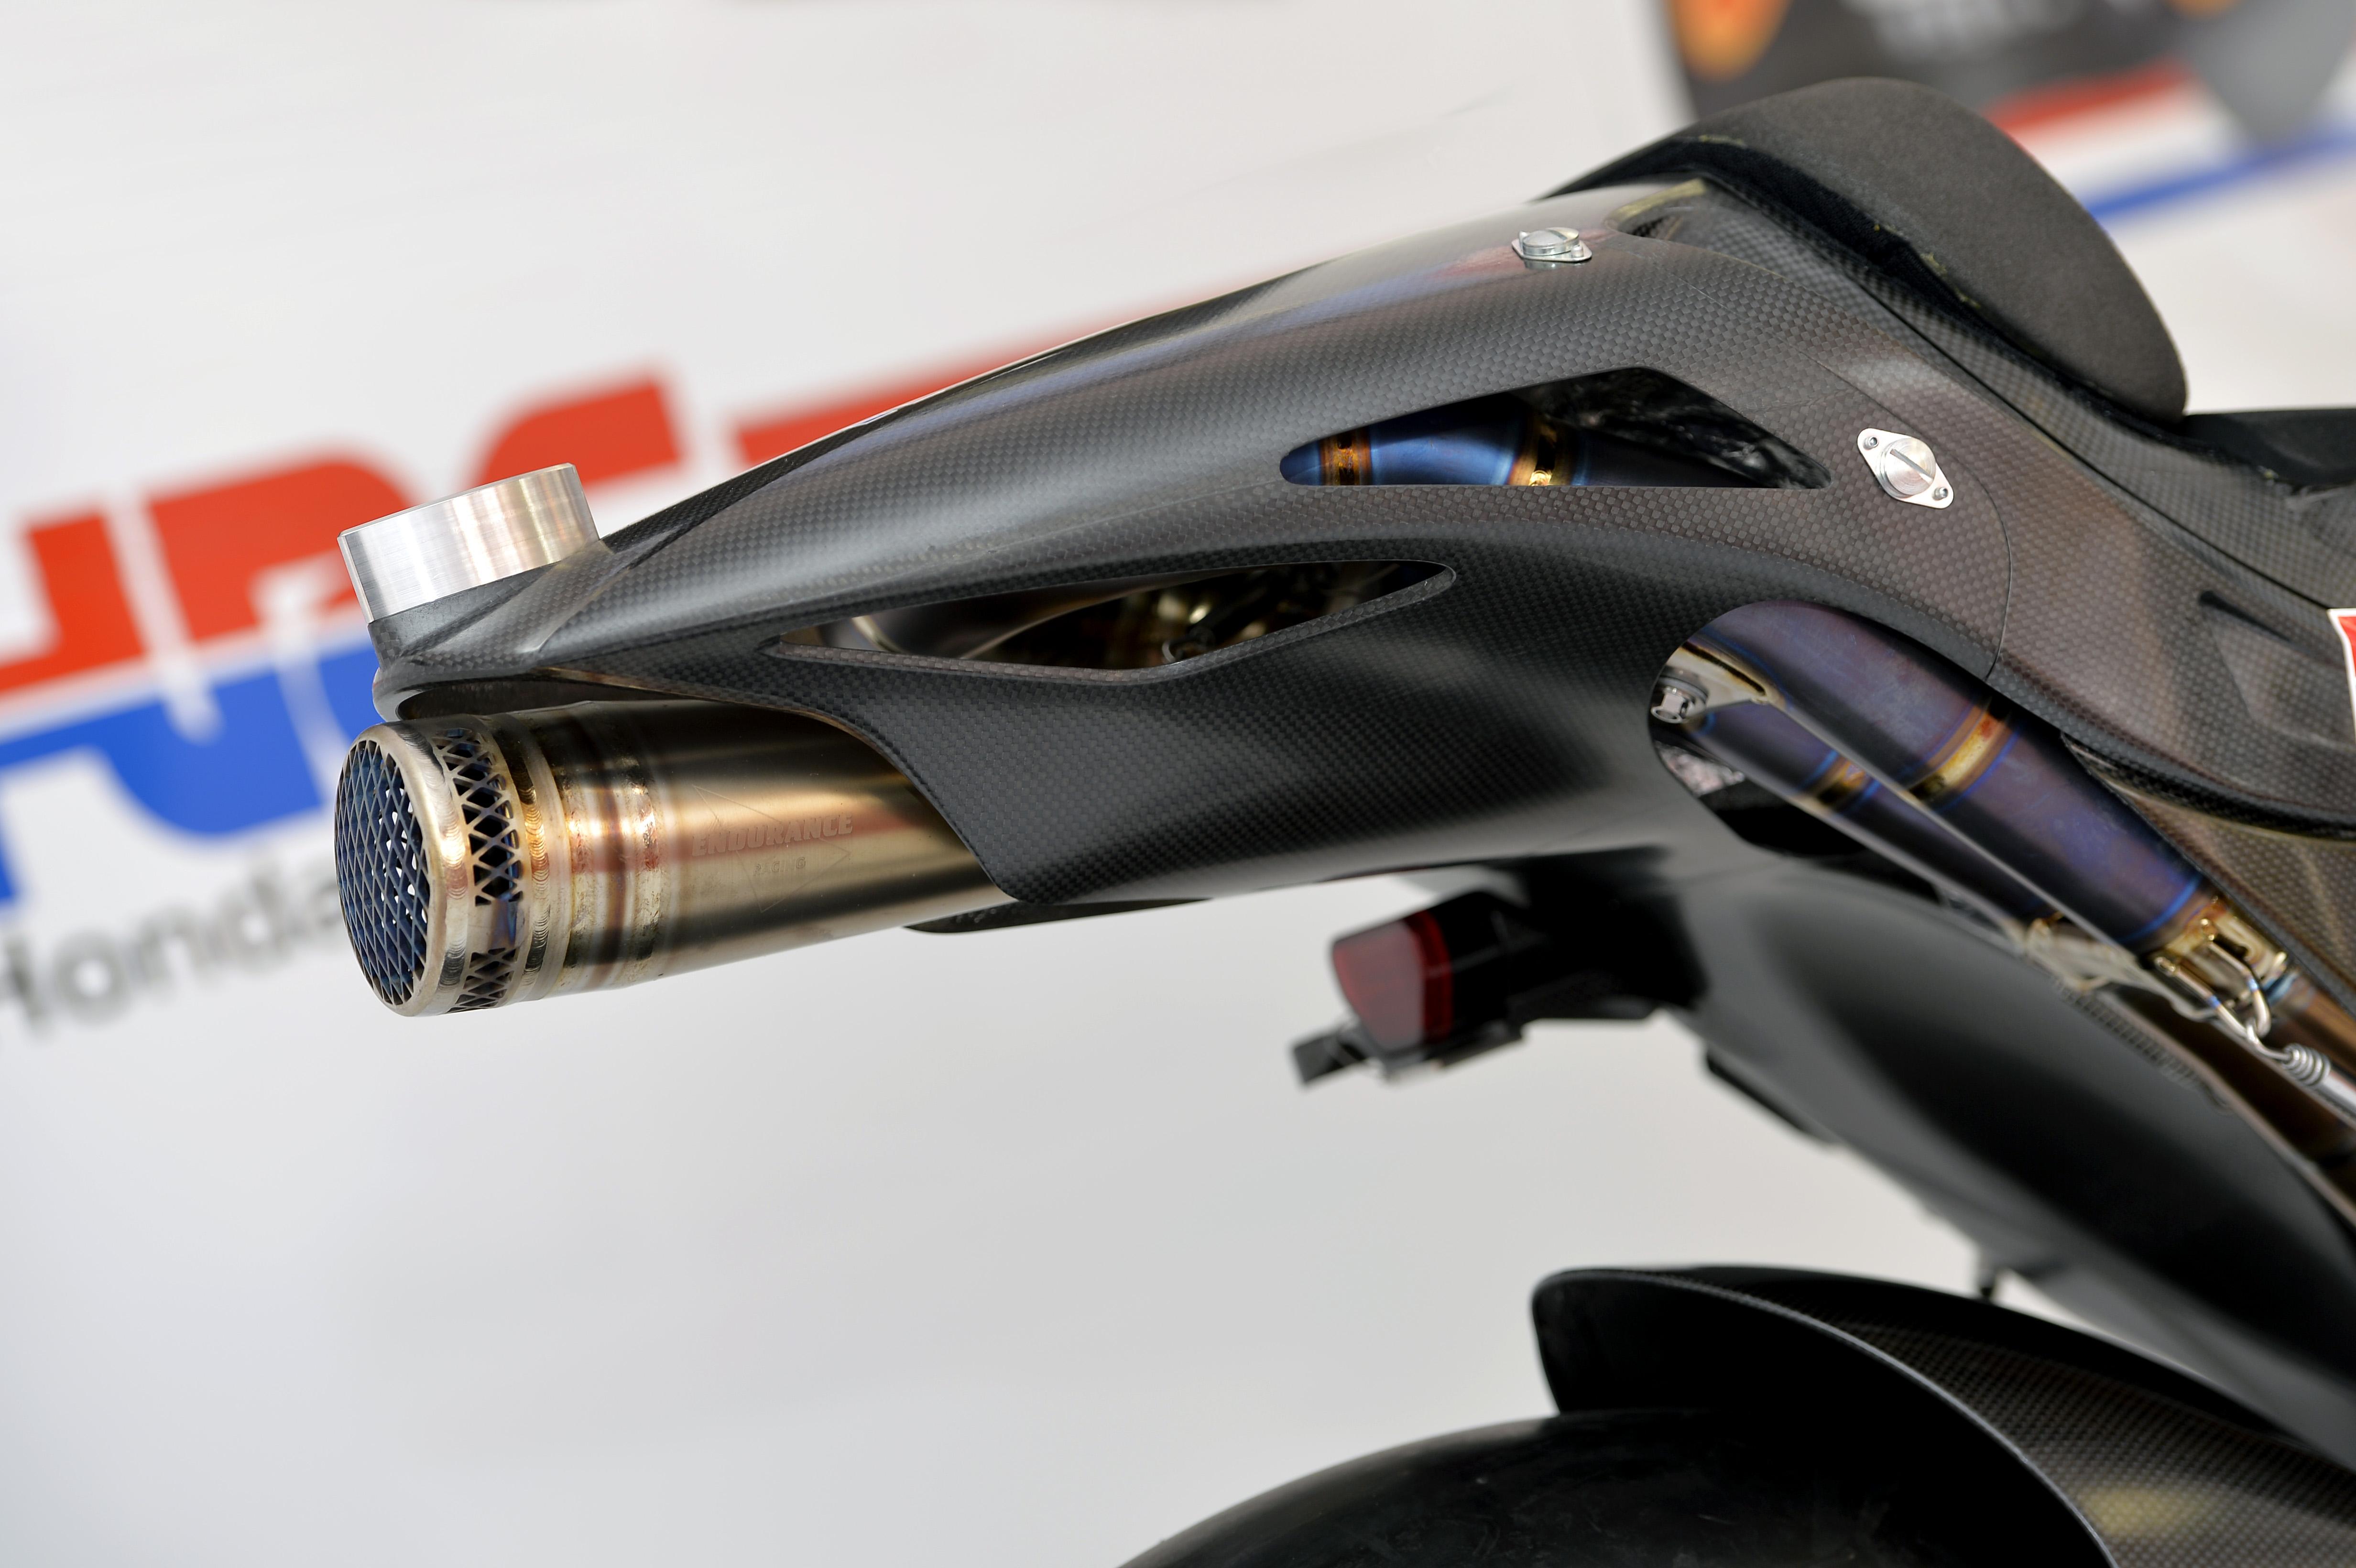 honda_rcv1000r_motogp_production_racer_www_racemoto_com_003